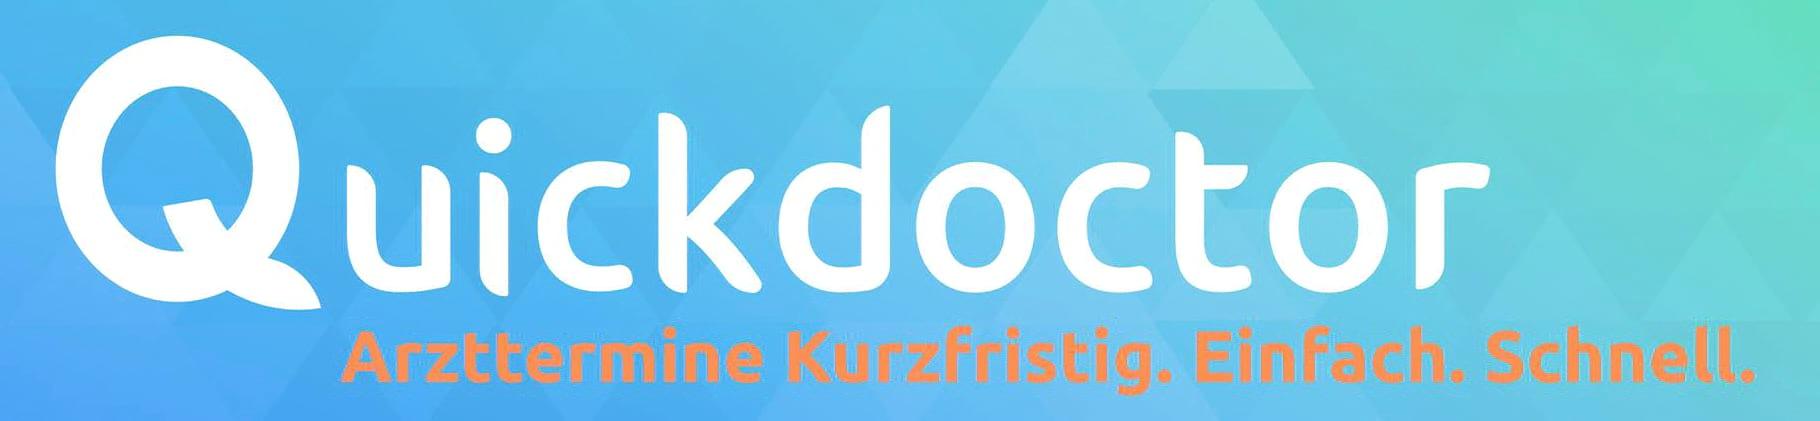 "BDV GmbH integriert Online-Terminvergabe ""Quickdoctor"" in VISInext"